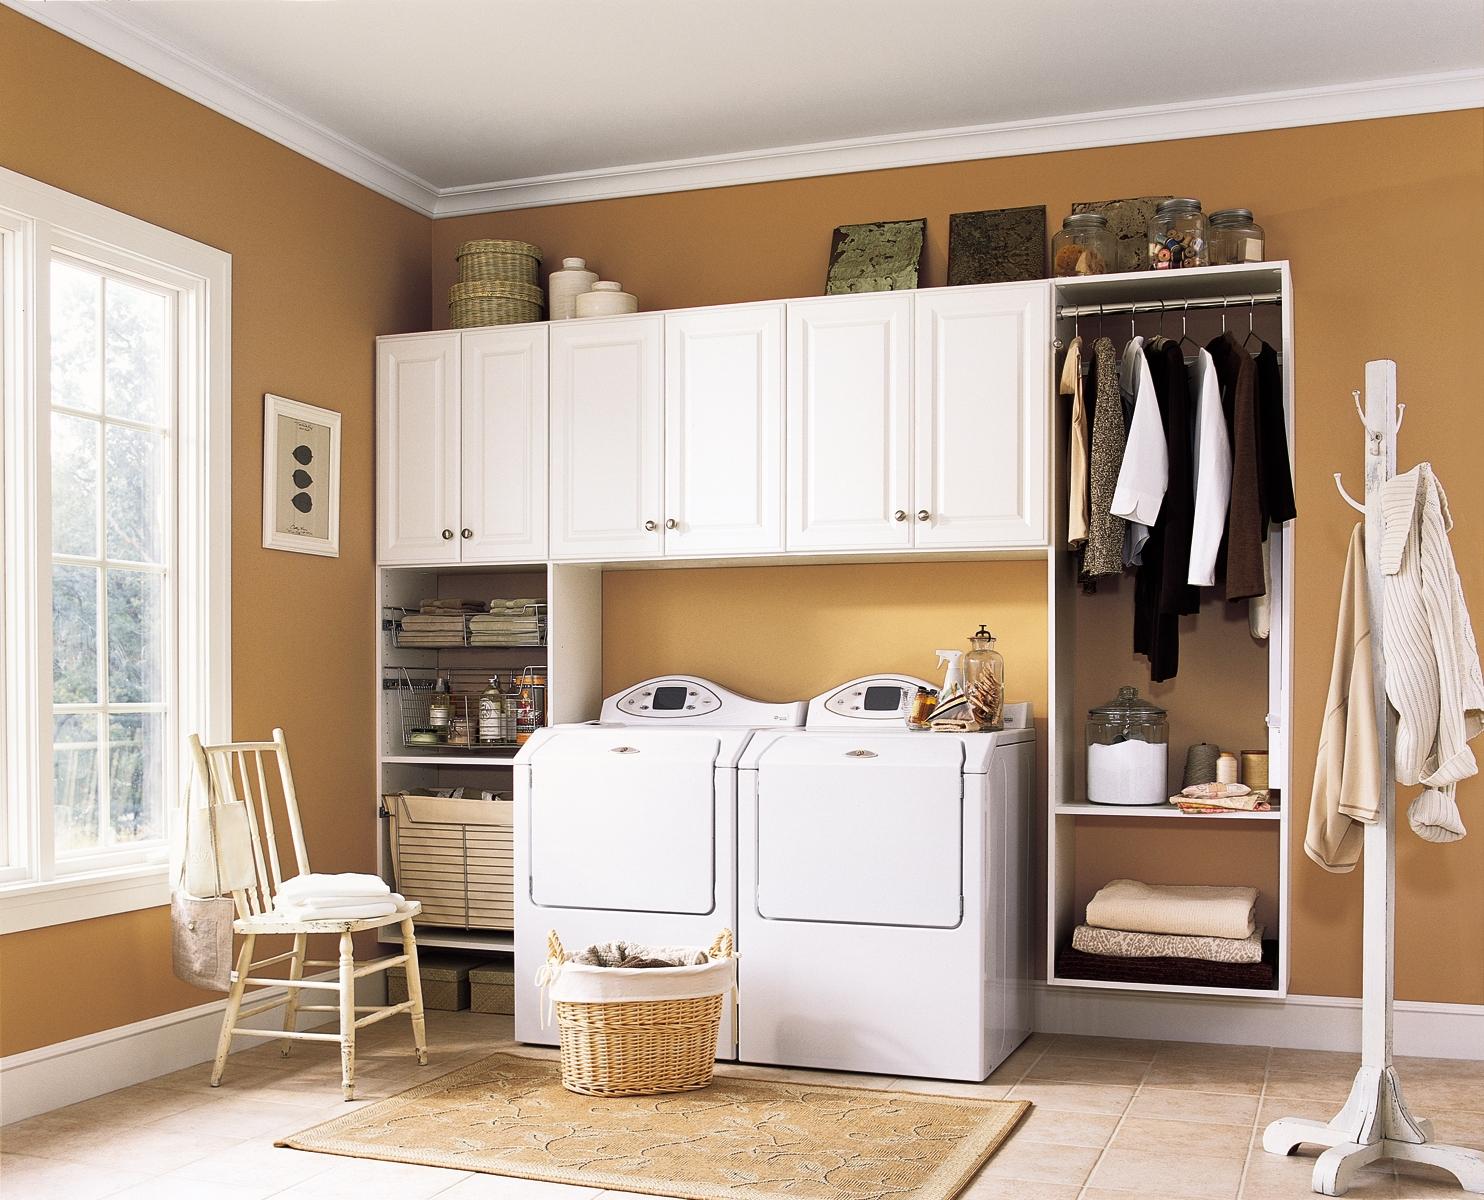 I Dream of Laundry Rooms | Apartments i Like blog on Laundry Room Decor  id=15595